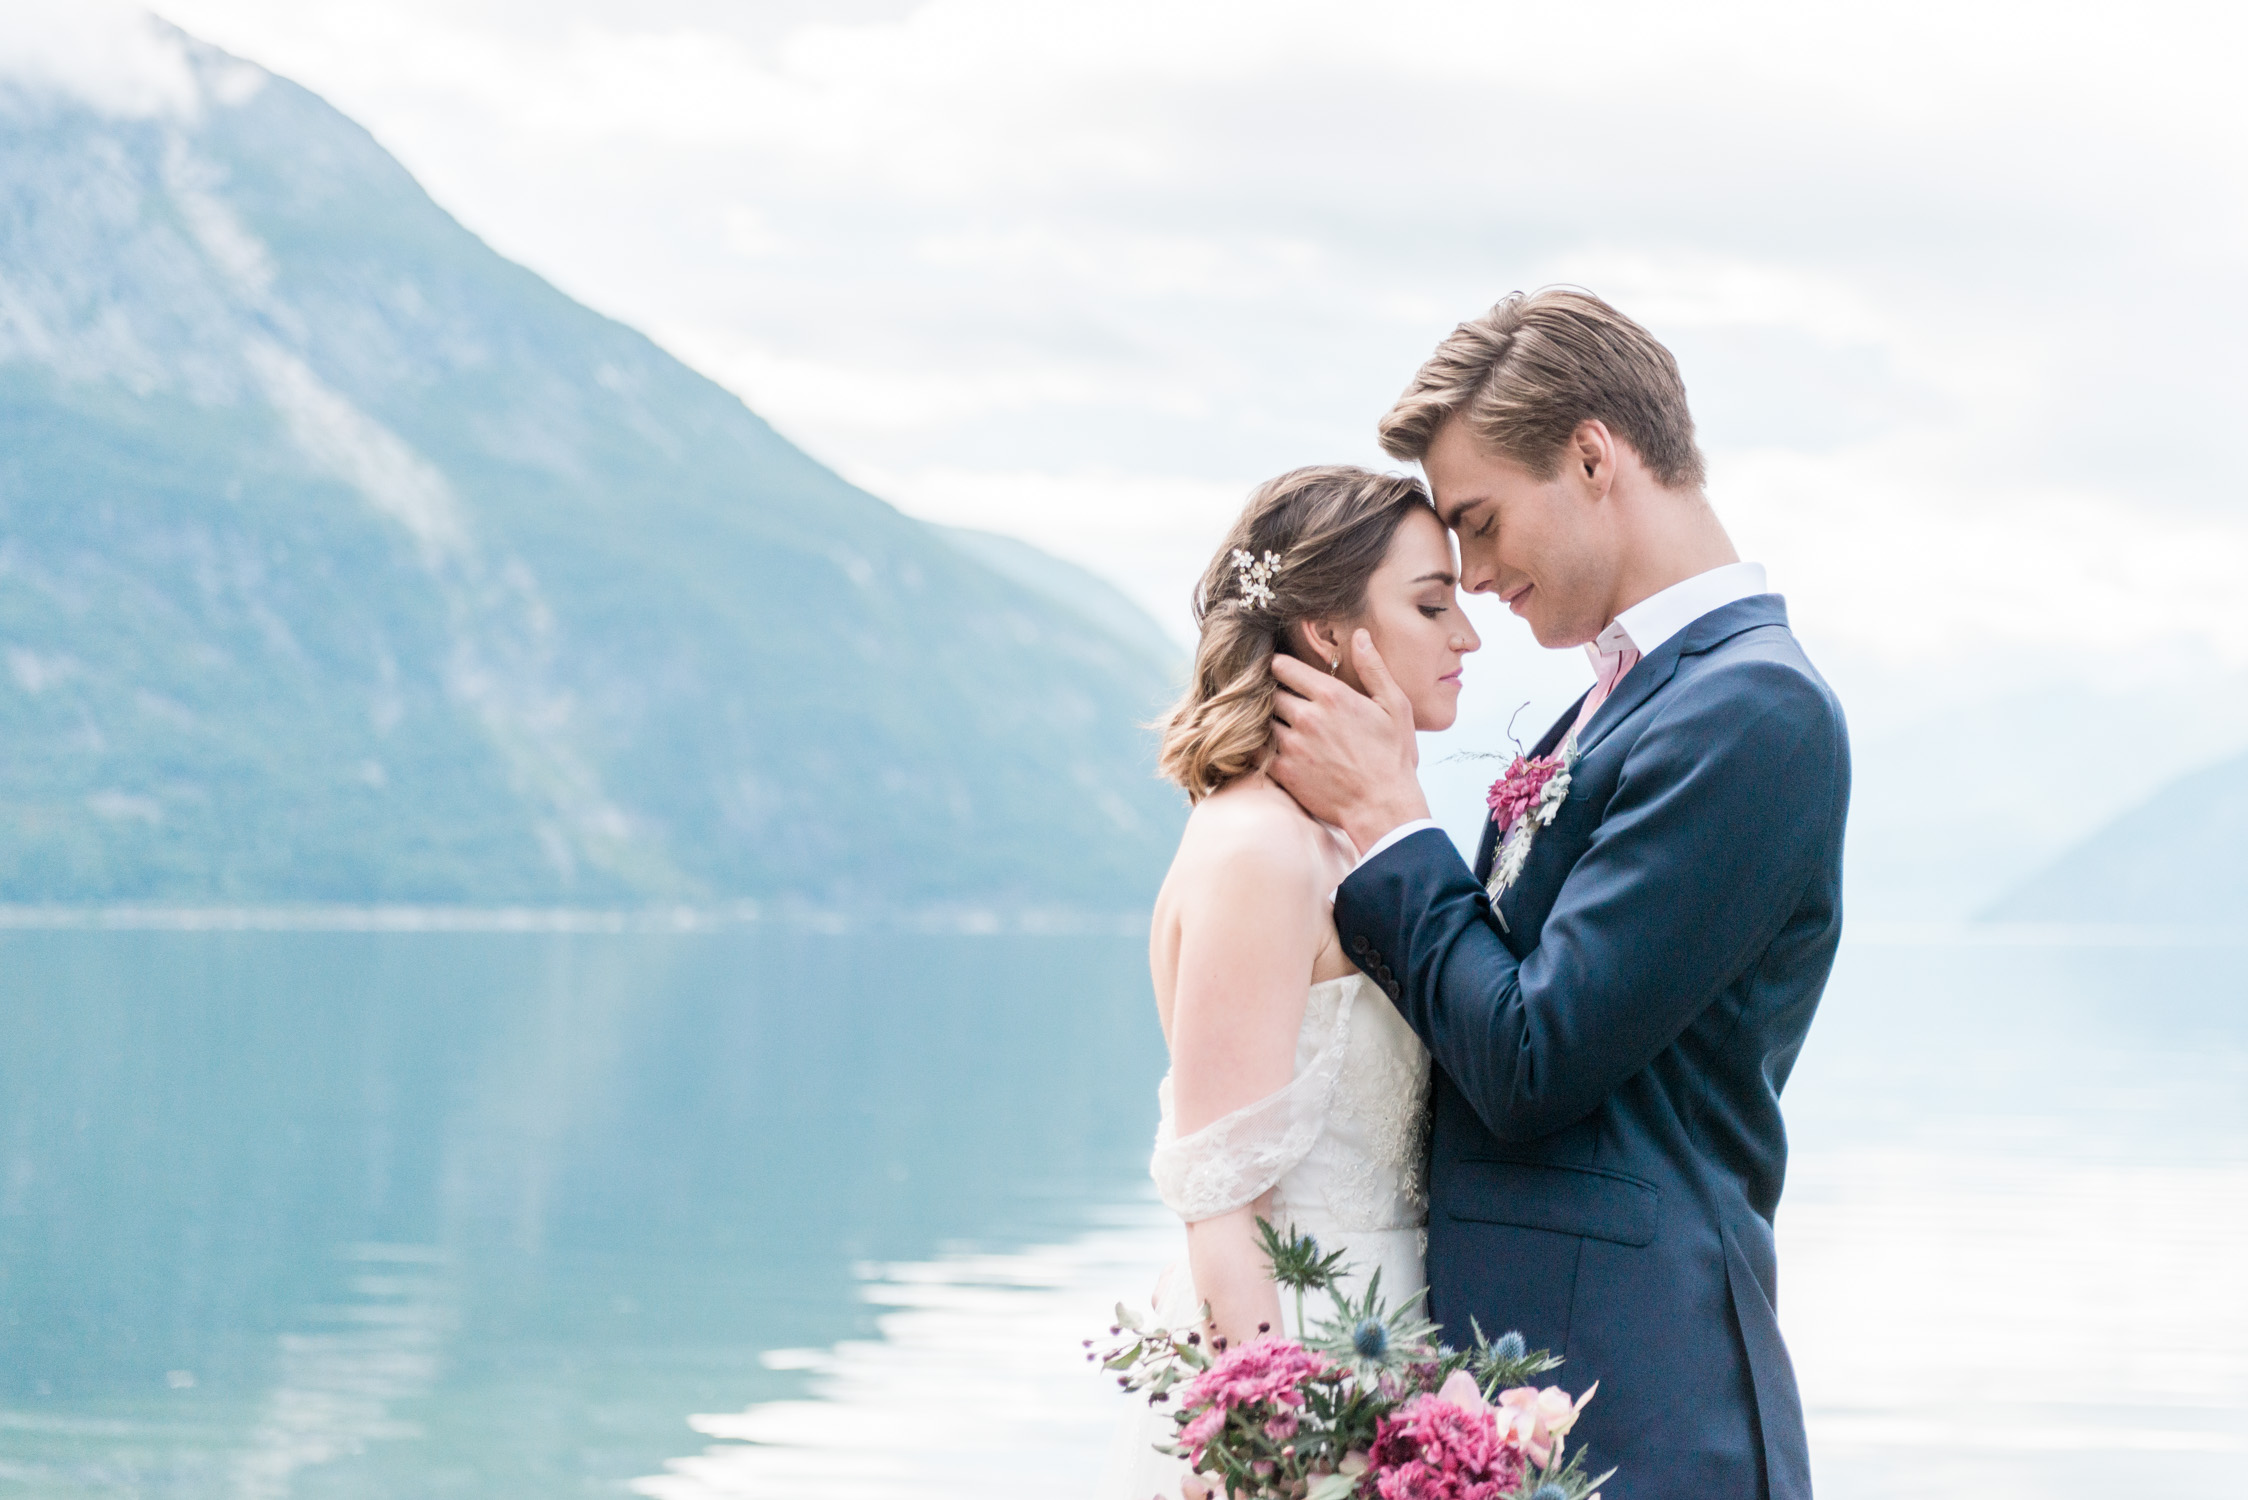 Bruidspaar in een Noors fjord